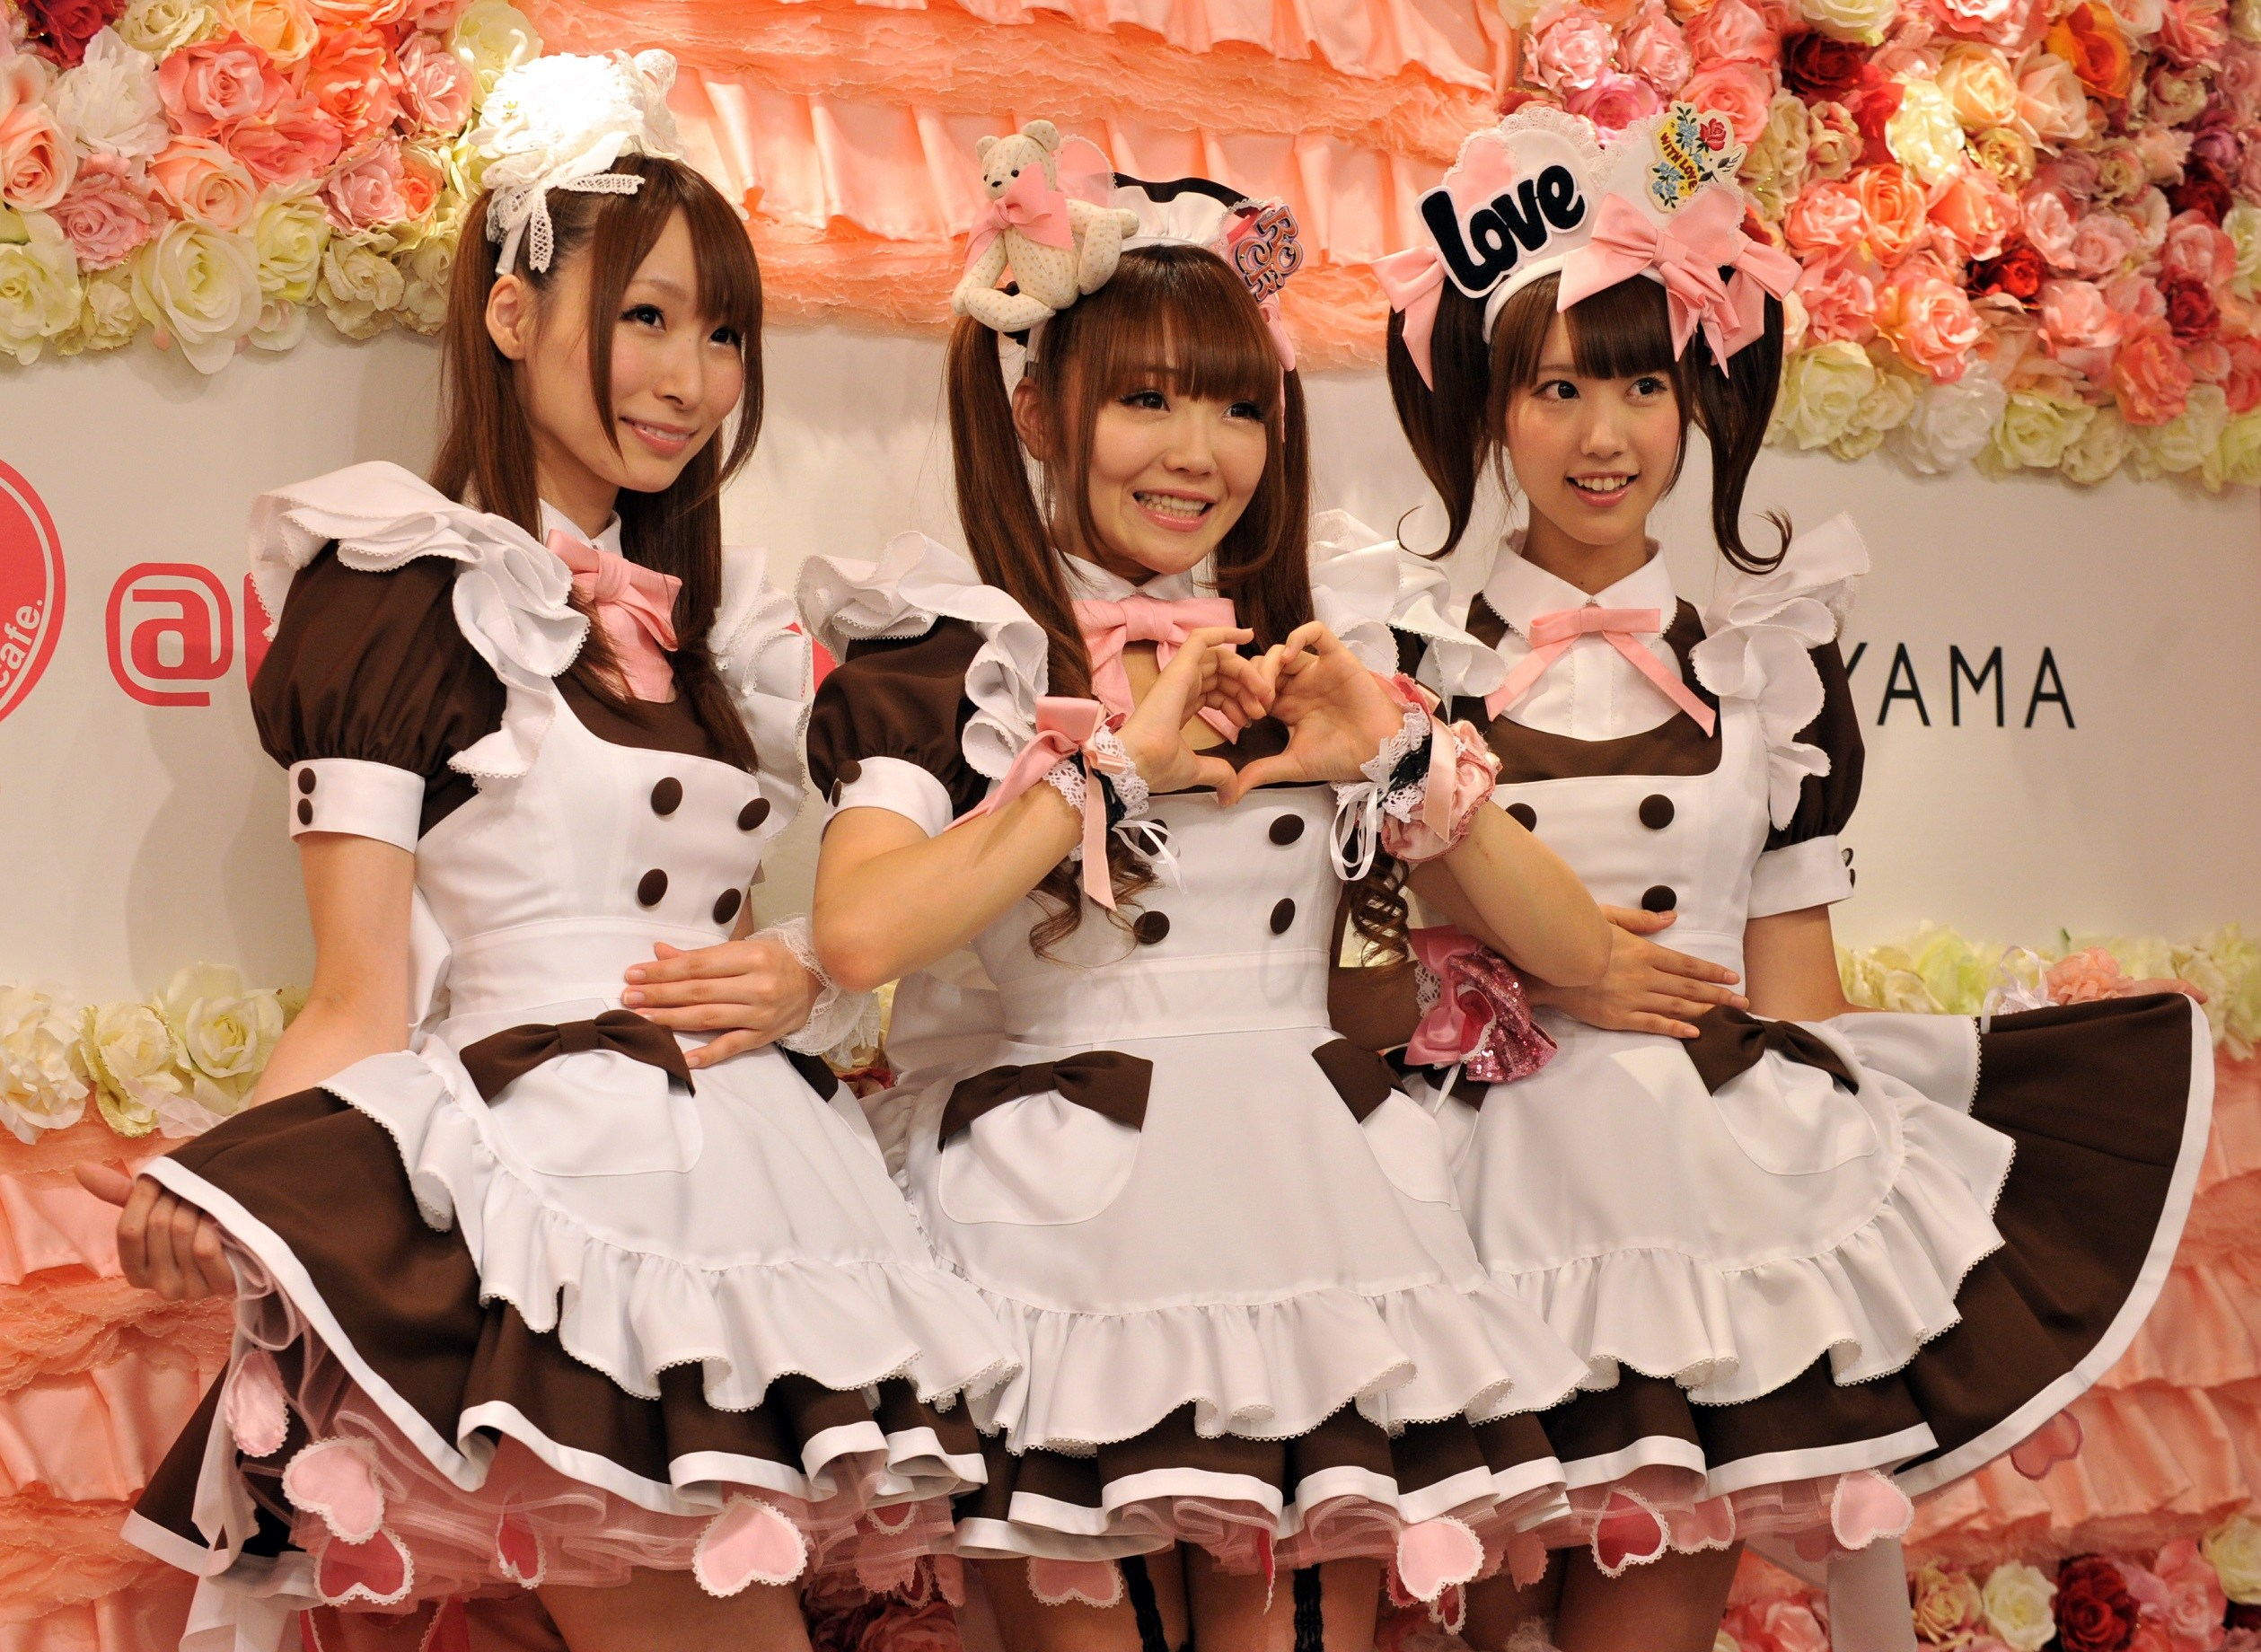 Japan Maid Cafe